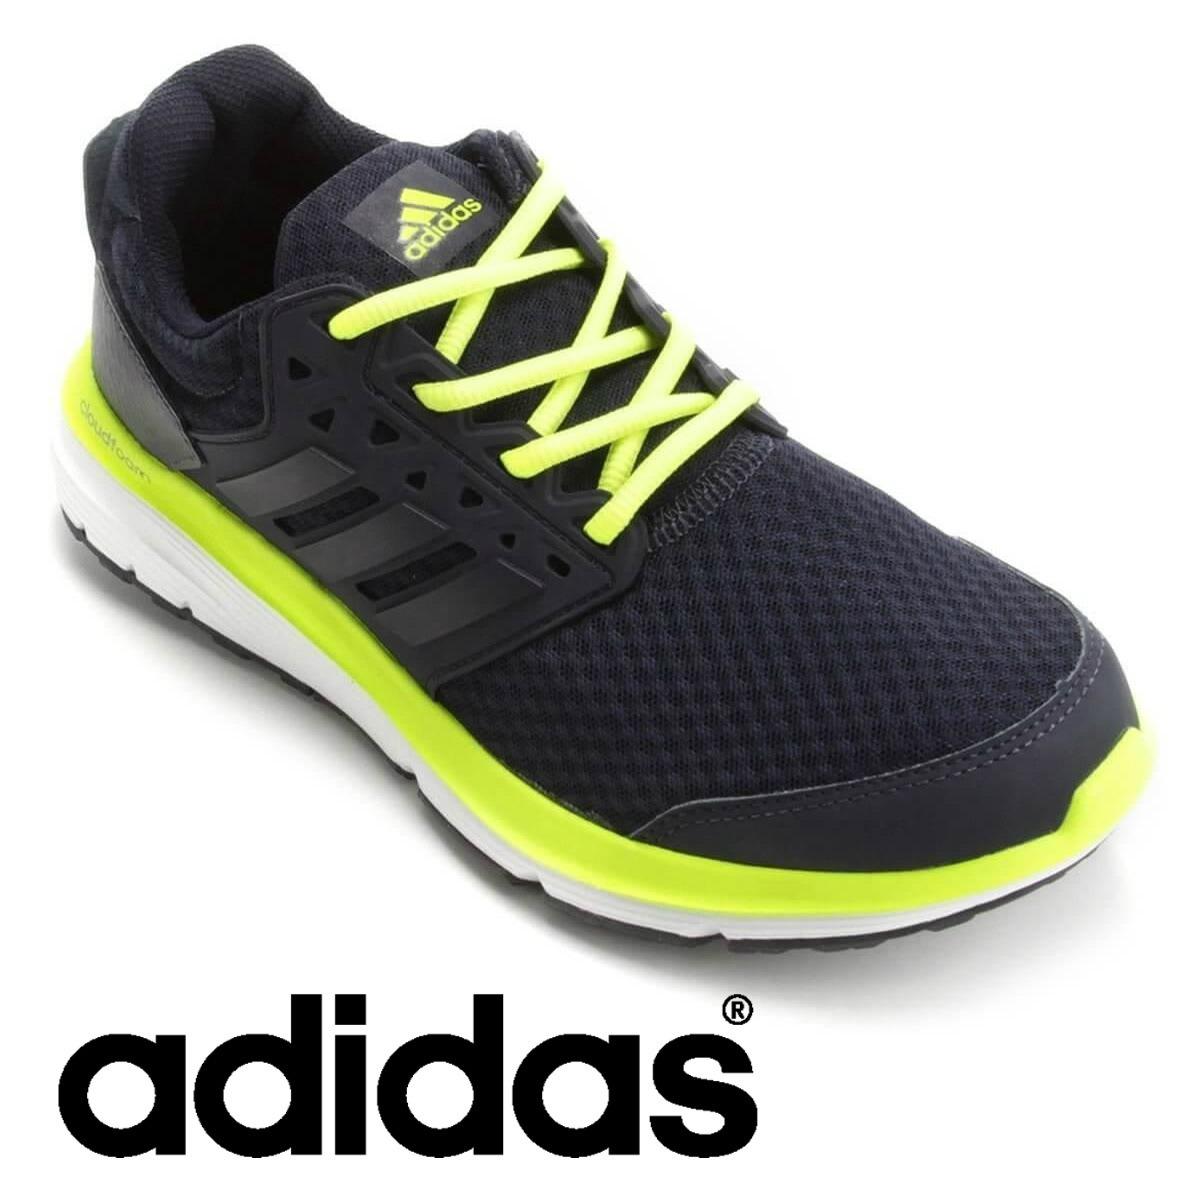 45adf818a tênis adidas masculino galaxy 3.1 ba8207 - original. Carregando zoom.